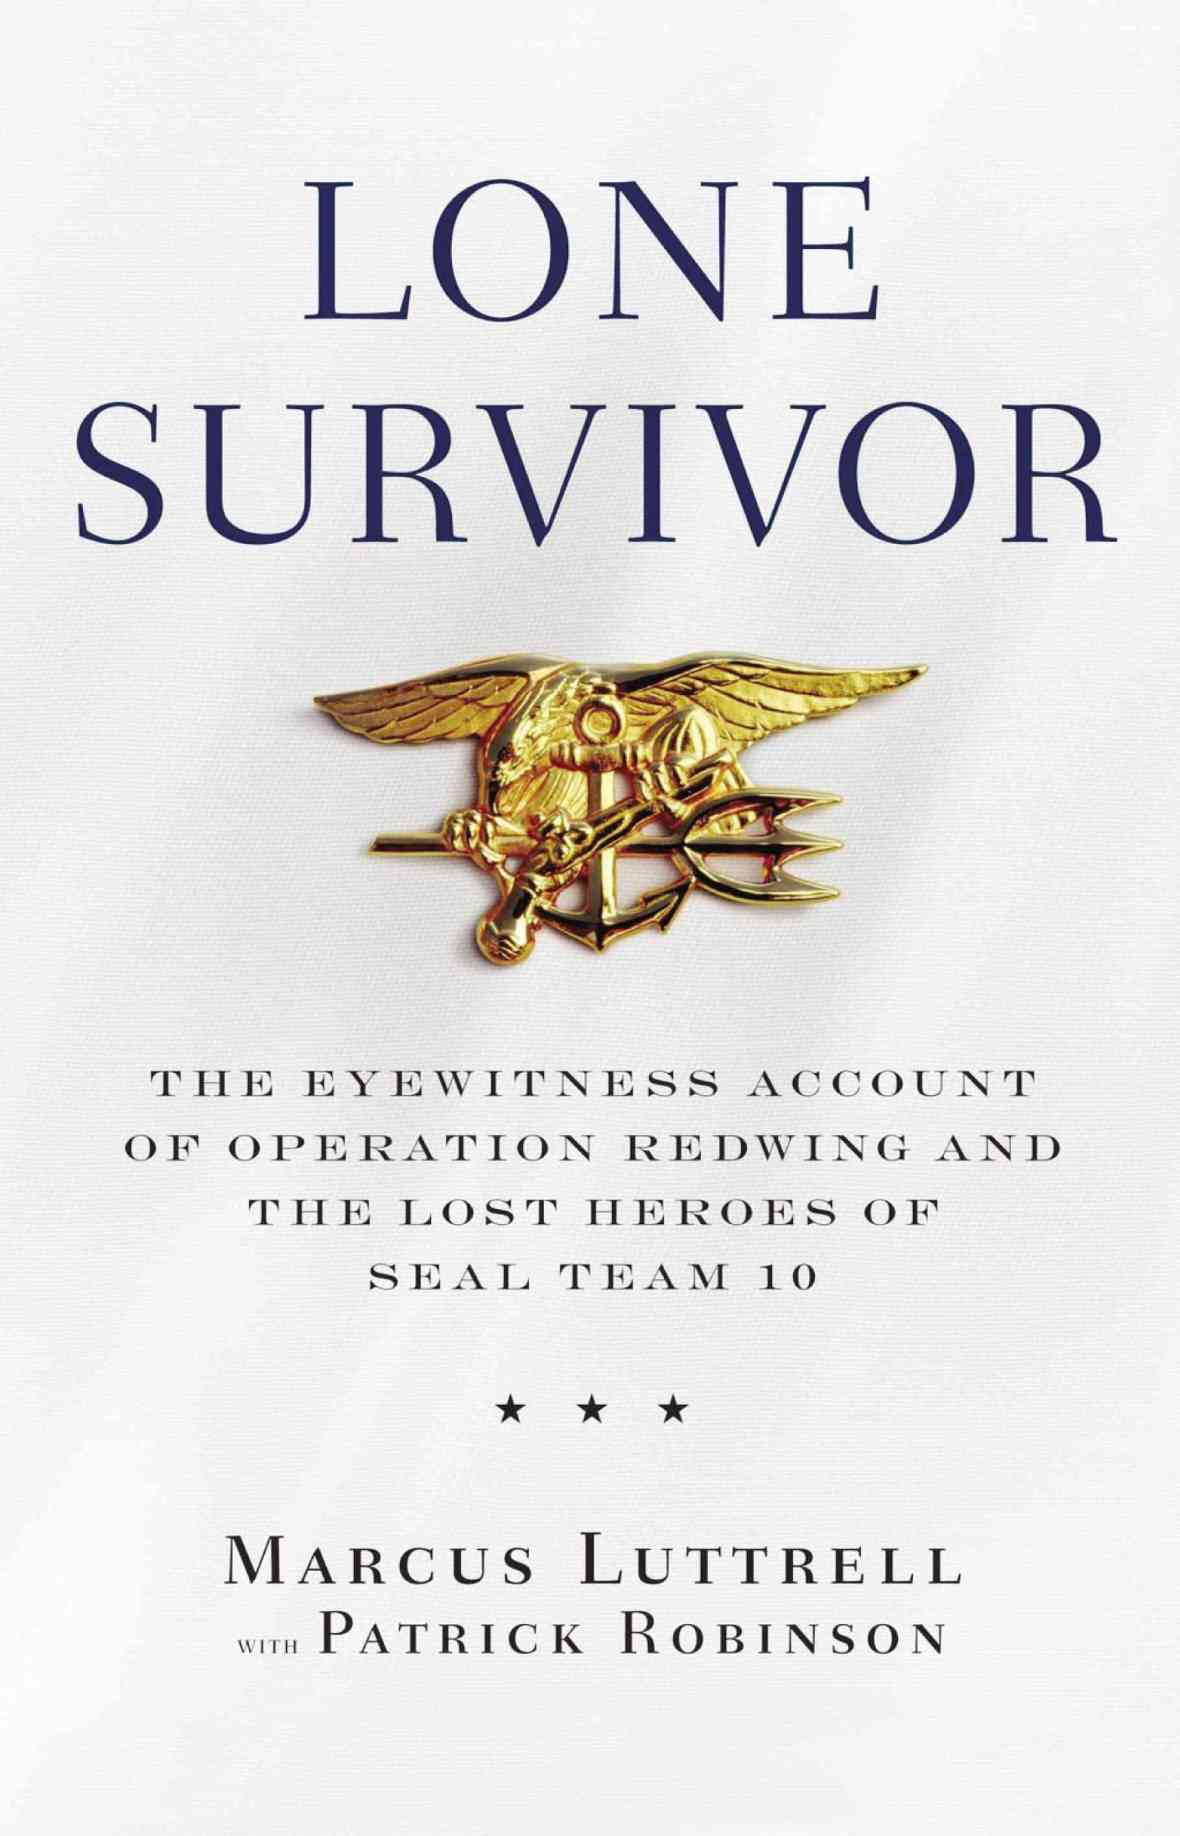 t0106lone-survivor_feat6_3